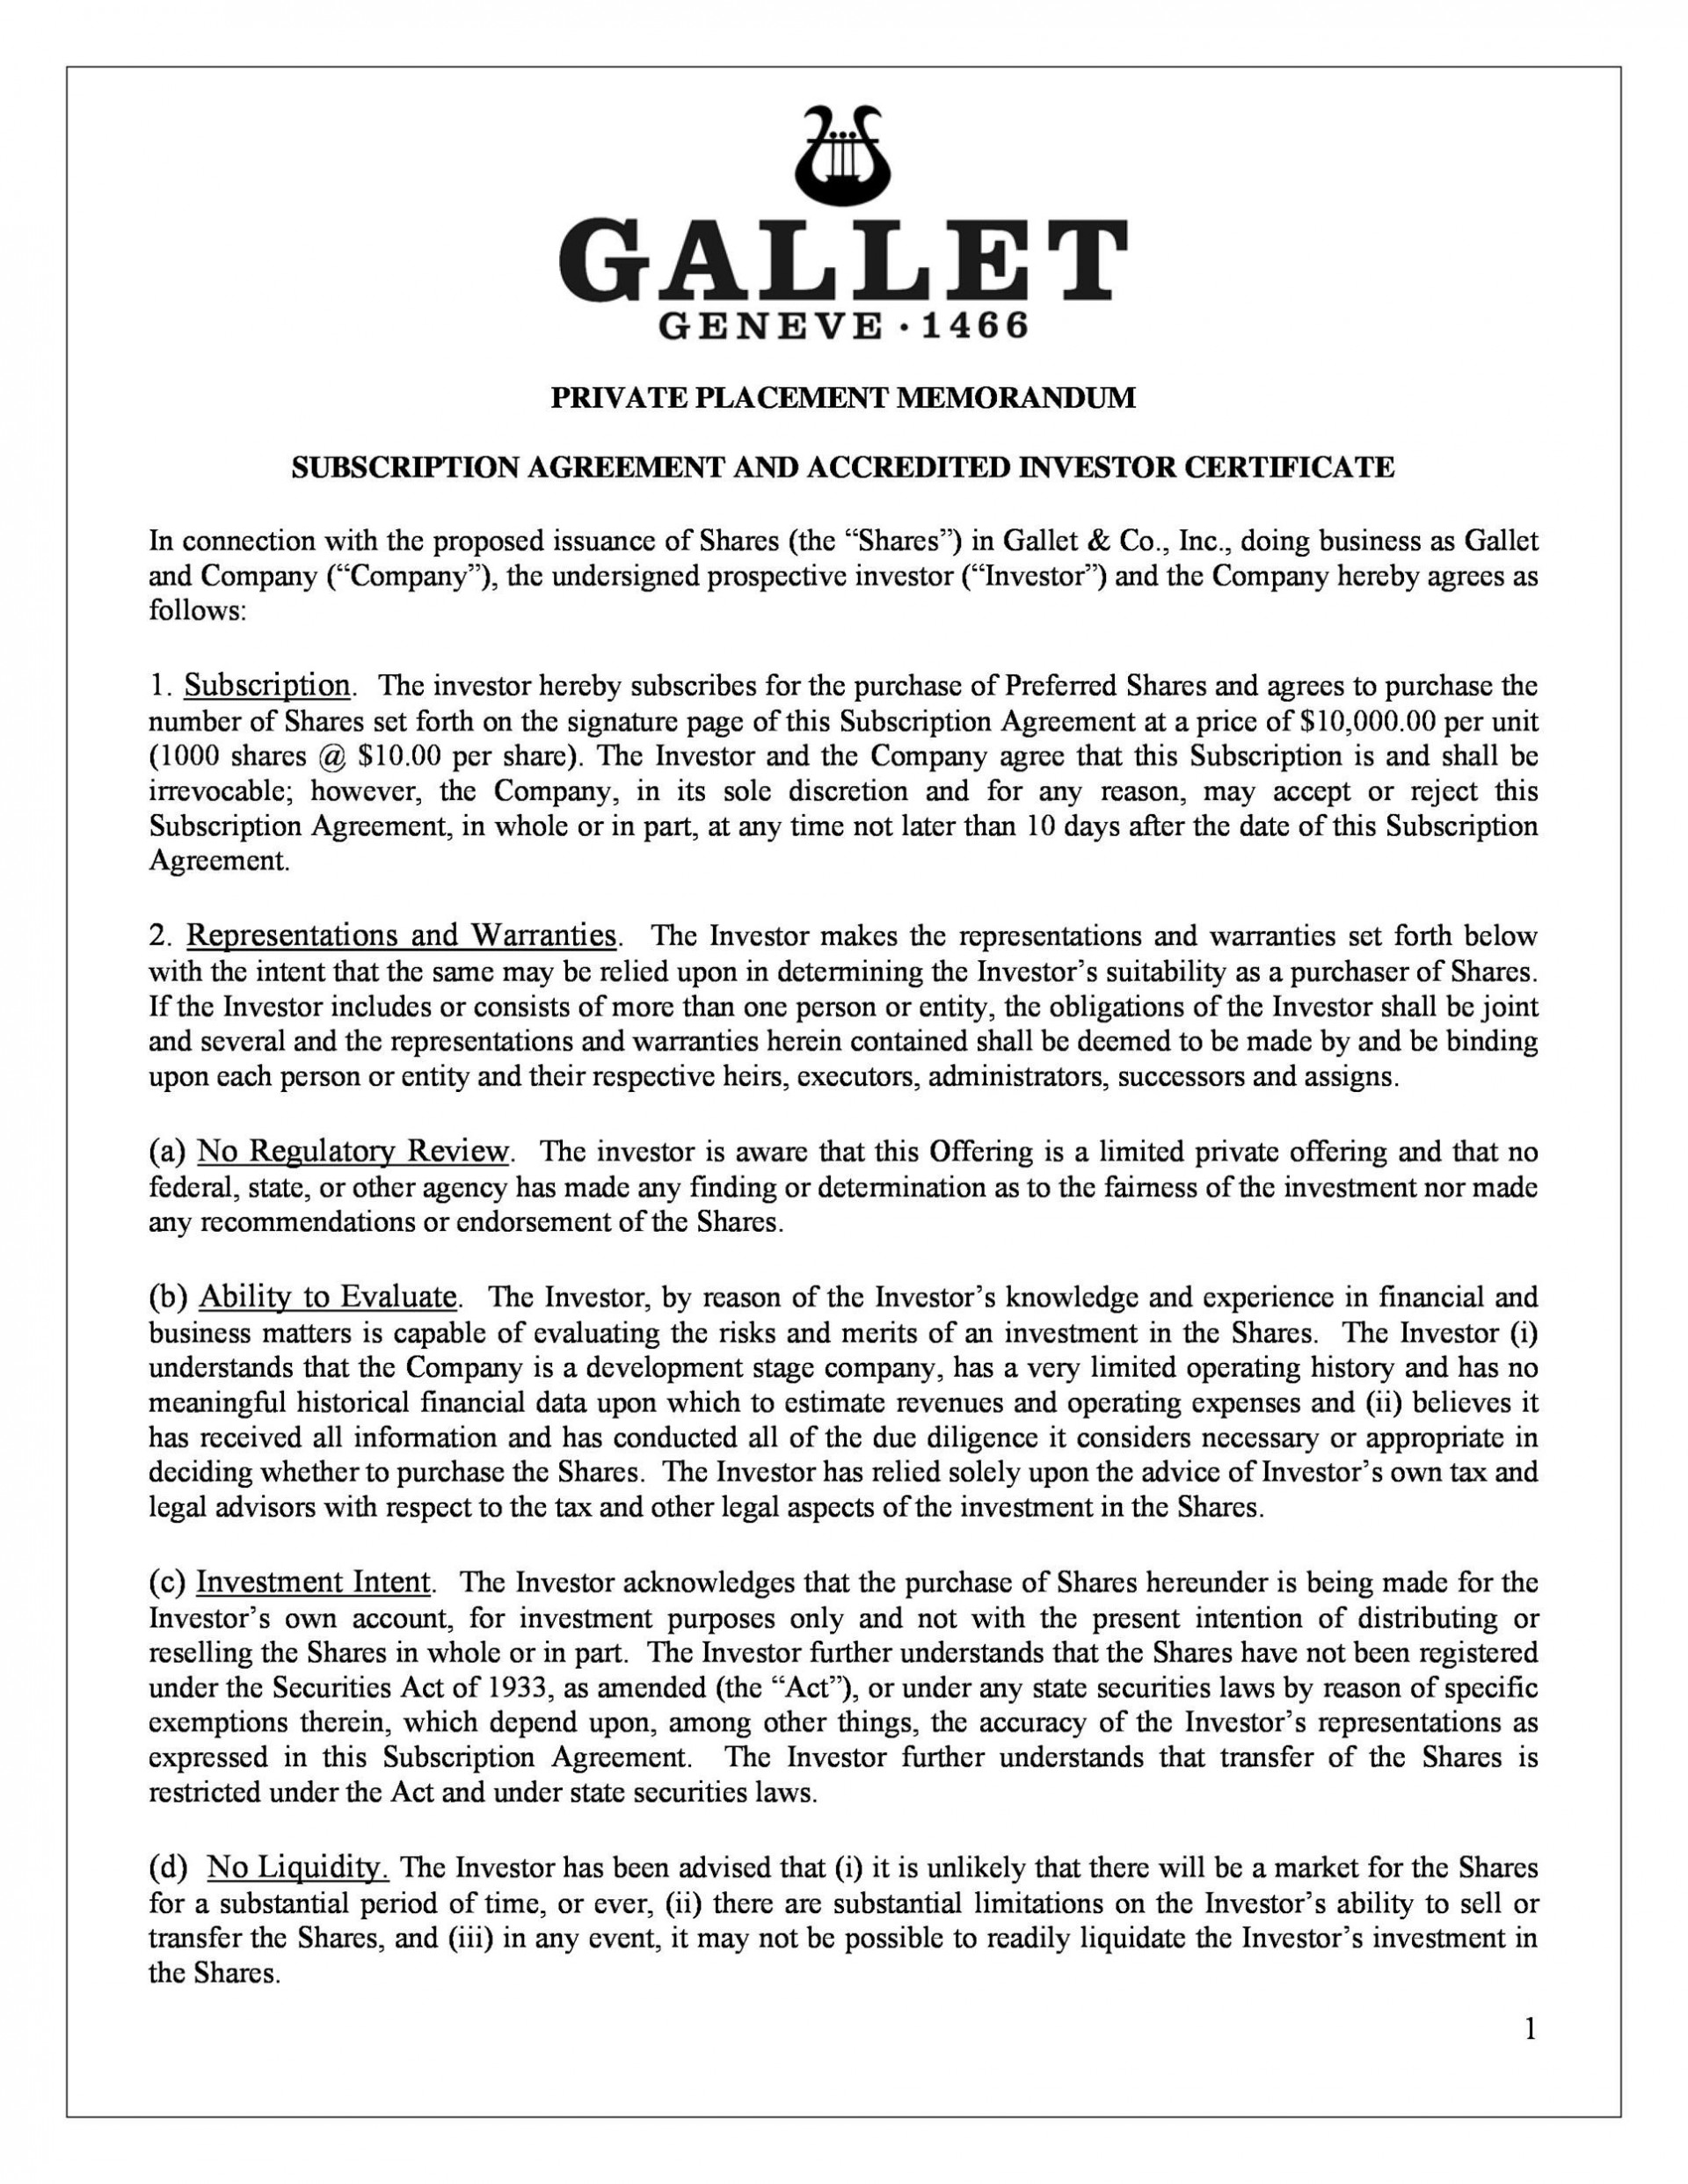 009 Excellent Private Placement Memorandum Format Concept  Template Canada Form Uk1920